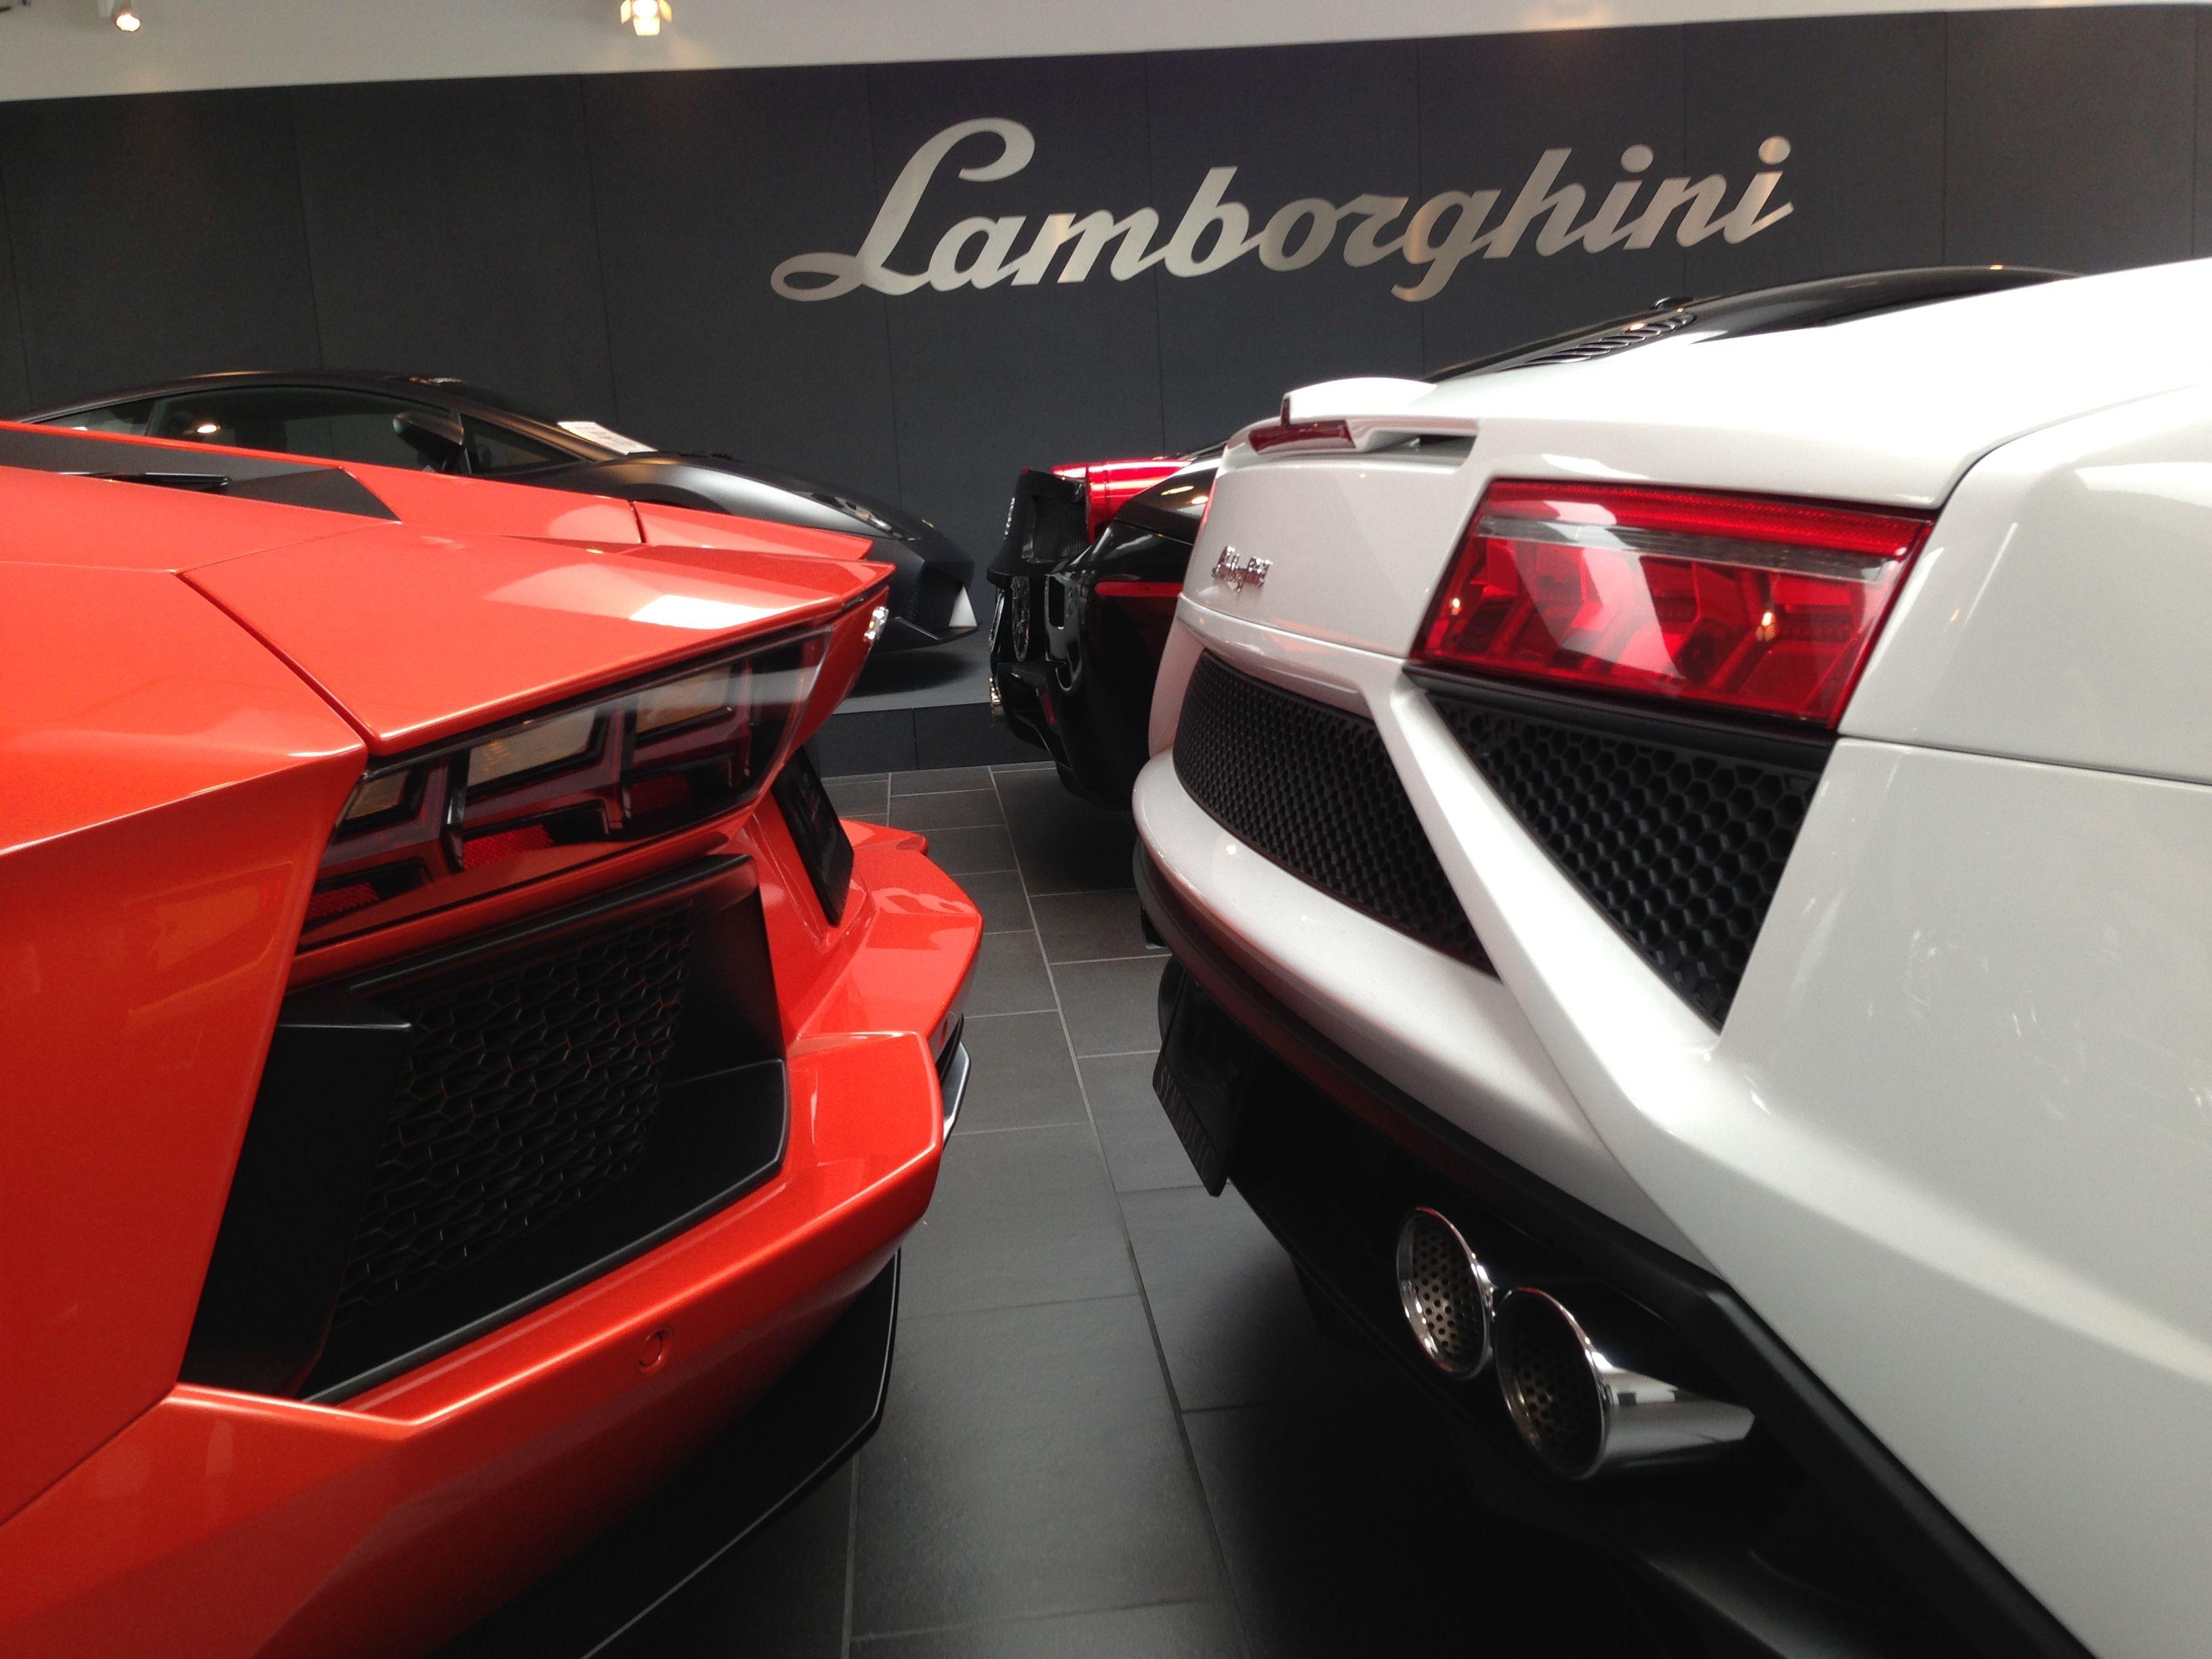 Lamborghini Butts Symbolic Motors Lamborghini San Diego Cars